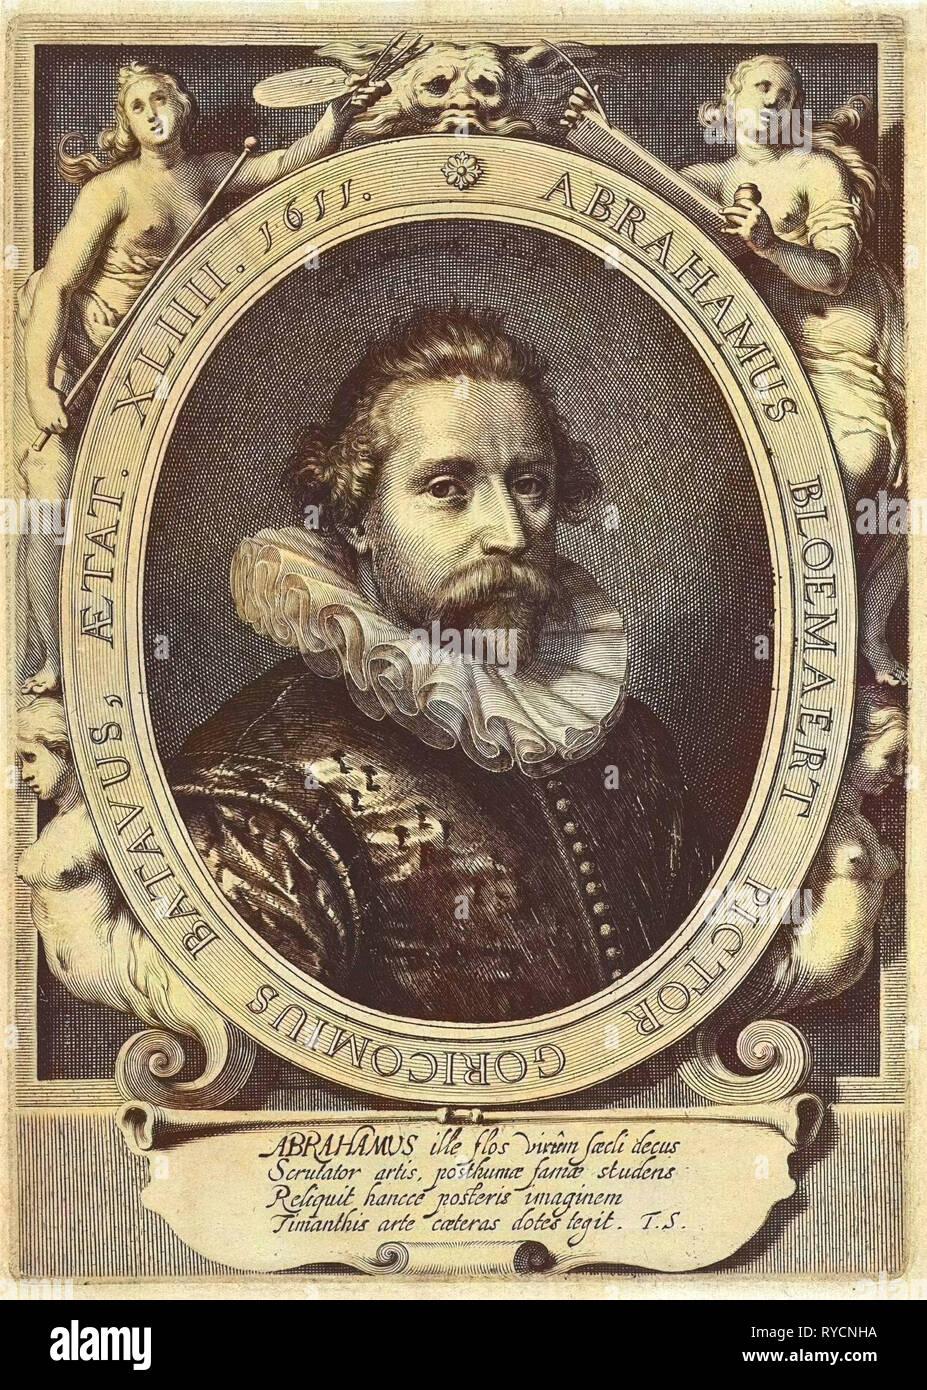 Portrait of Abraham Bloemaert, Willem Isaacsz. van Swanenburg, Theodorus Schrevelius, 1611 - Stock Image